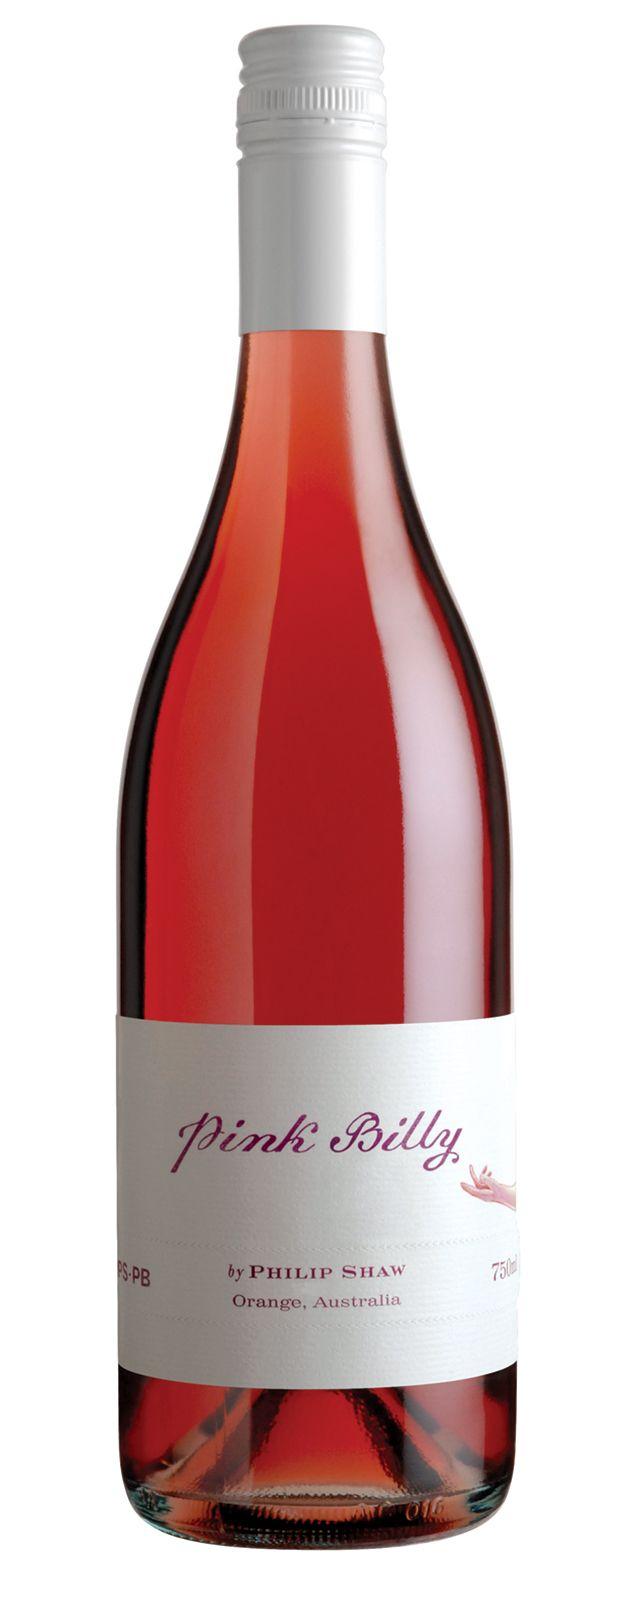 Pink Billy Saignee 2013 Philip Shaw Wines Wine Bottle Wines Rose Wine Bottle